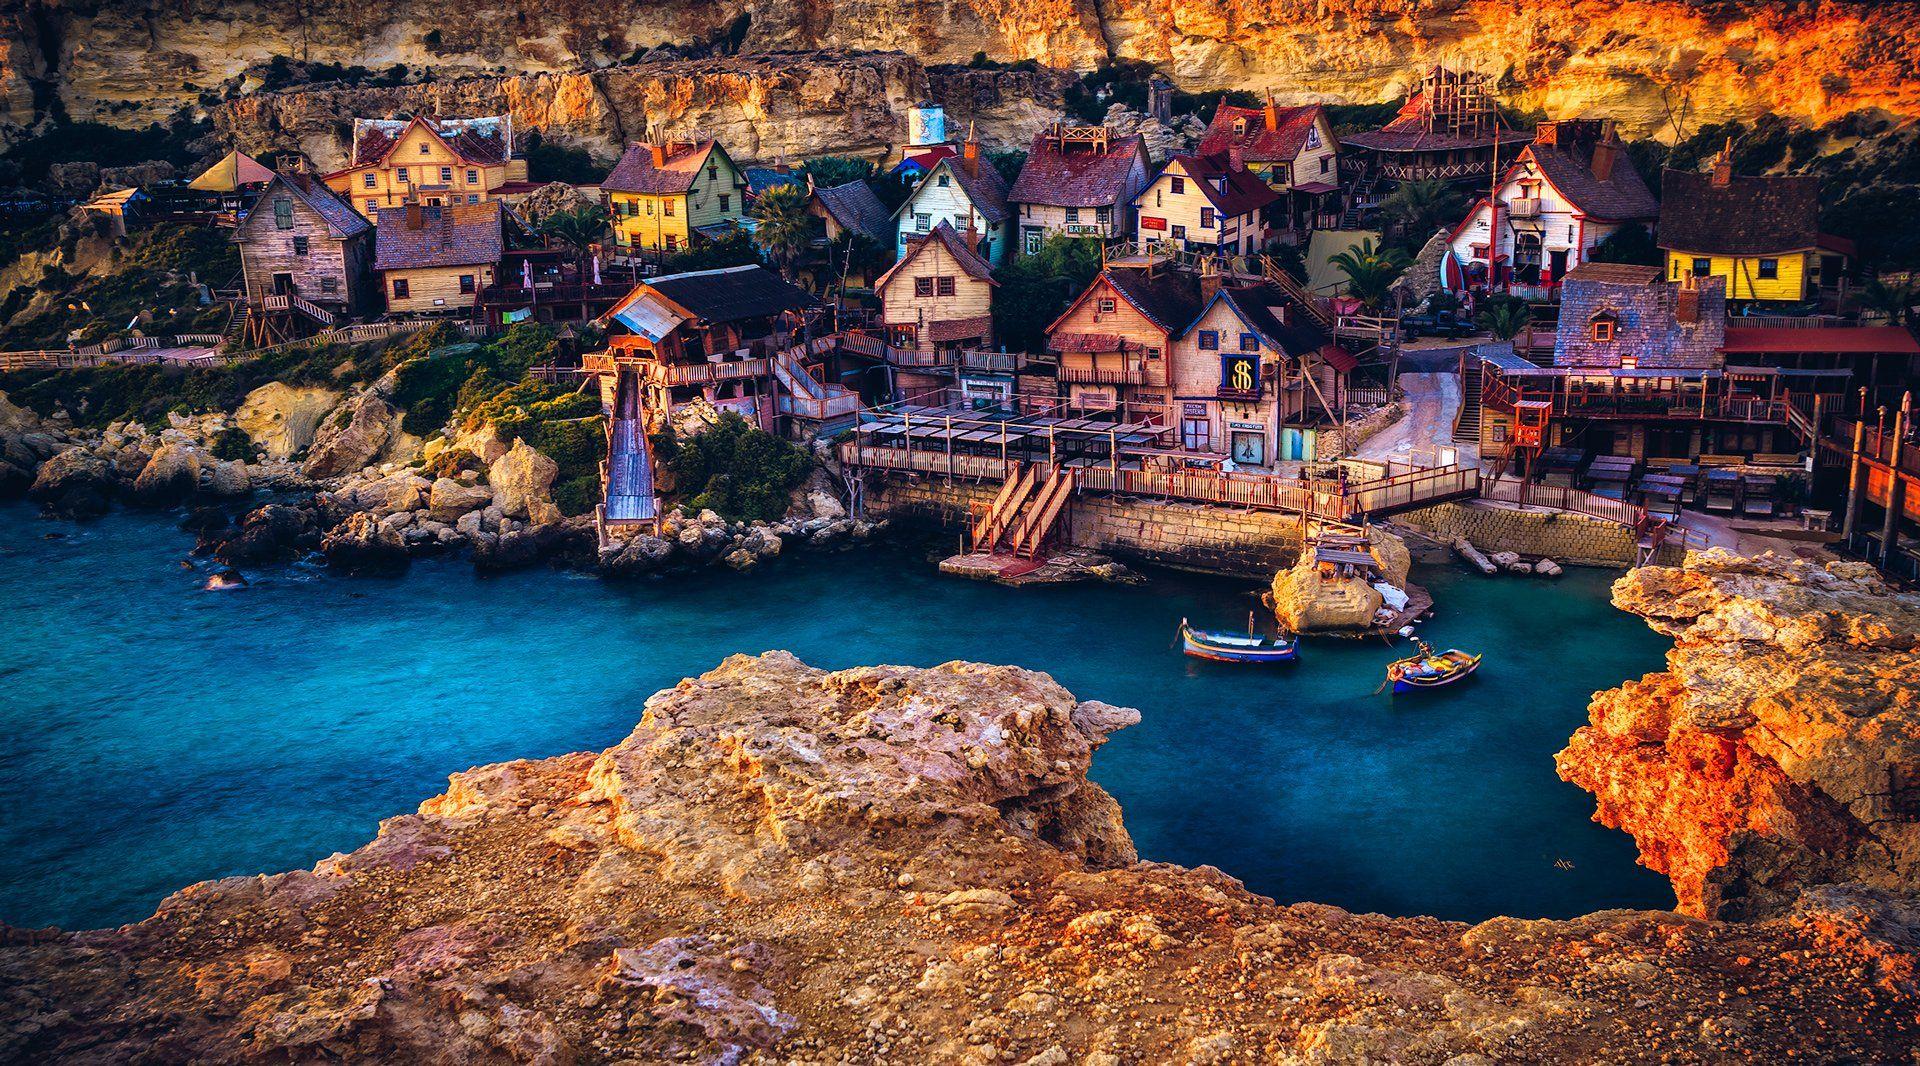 sunset, malta, popeye village, colors, travel, Руслан Болгов (Axe)